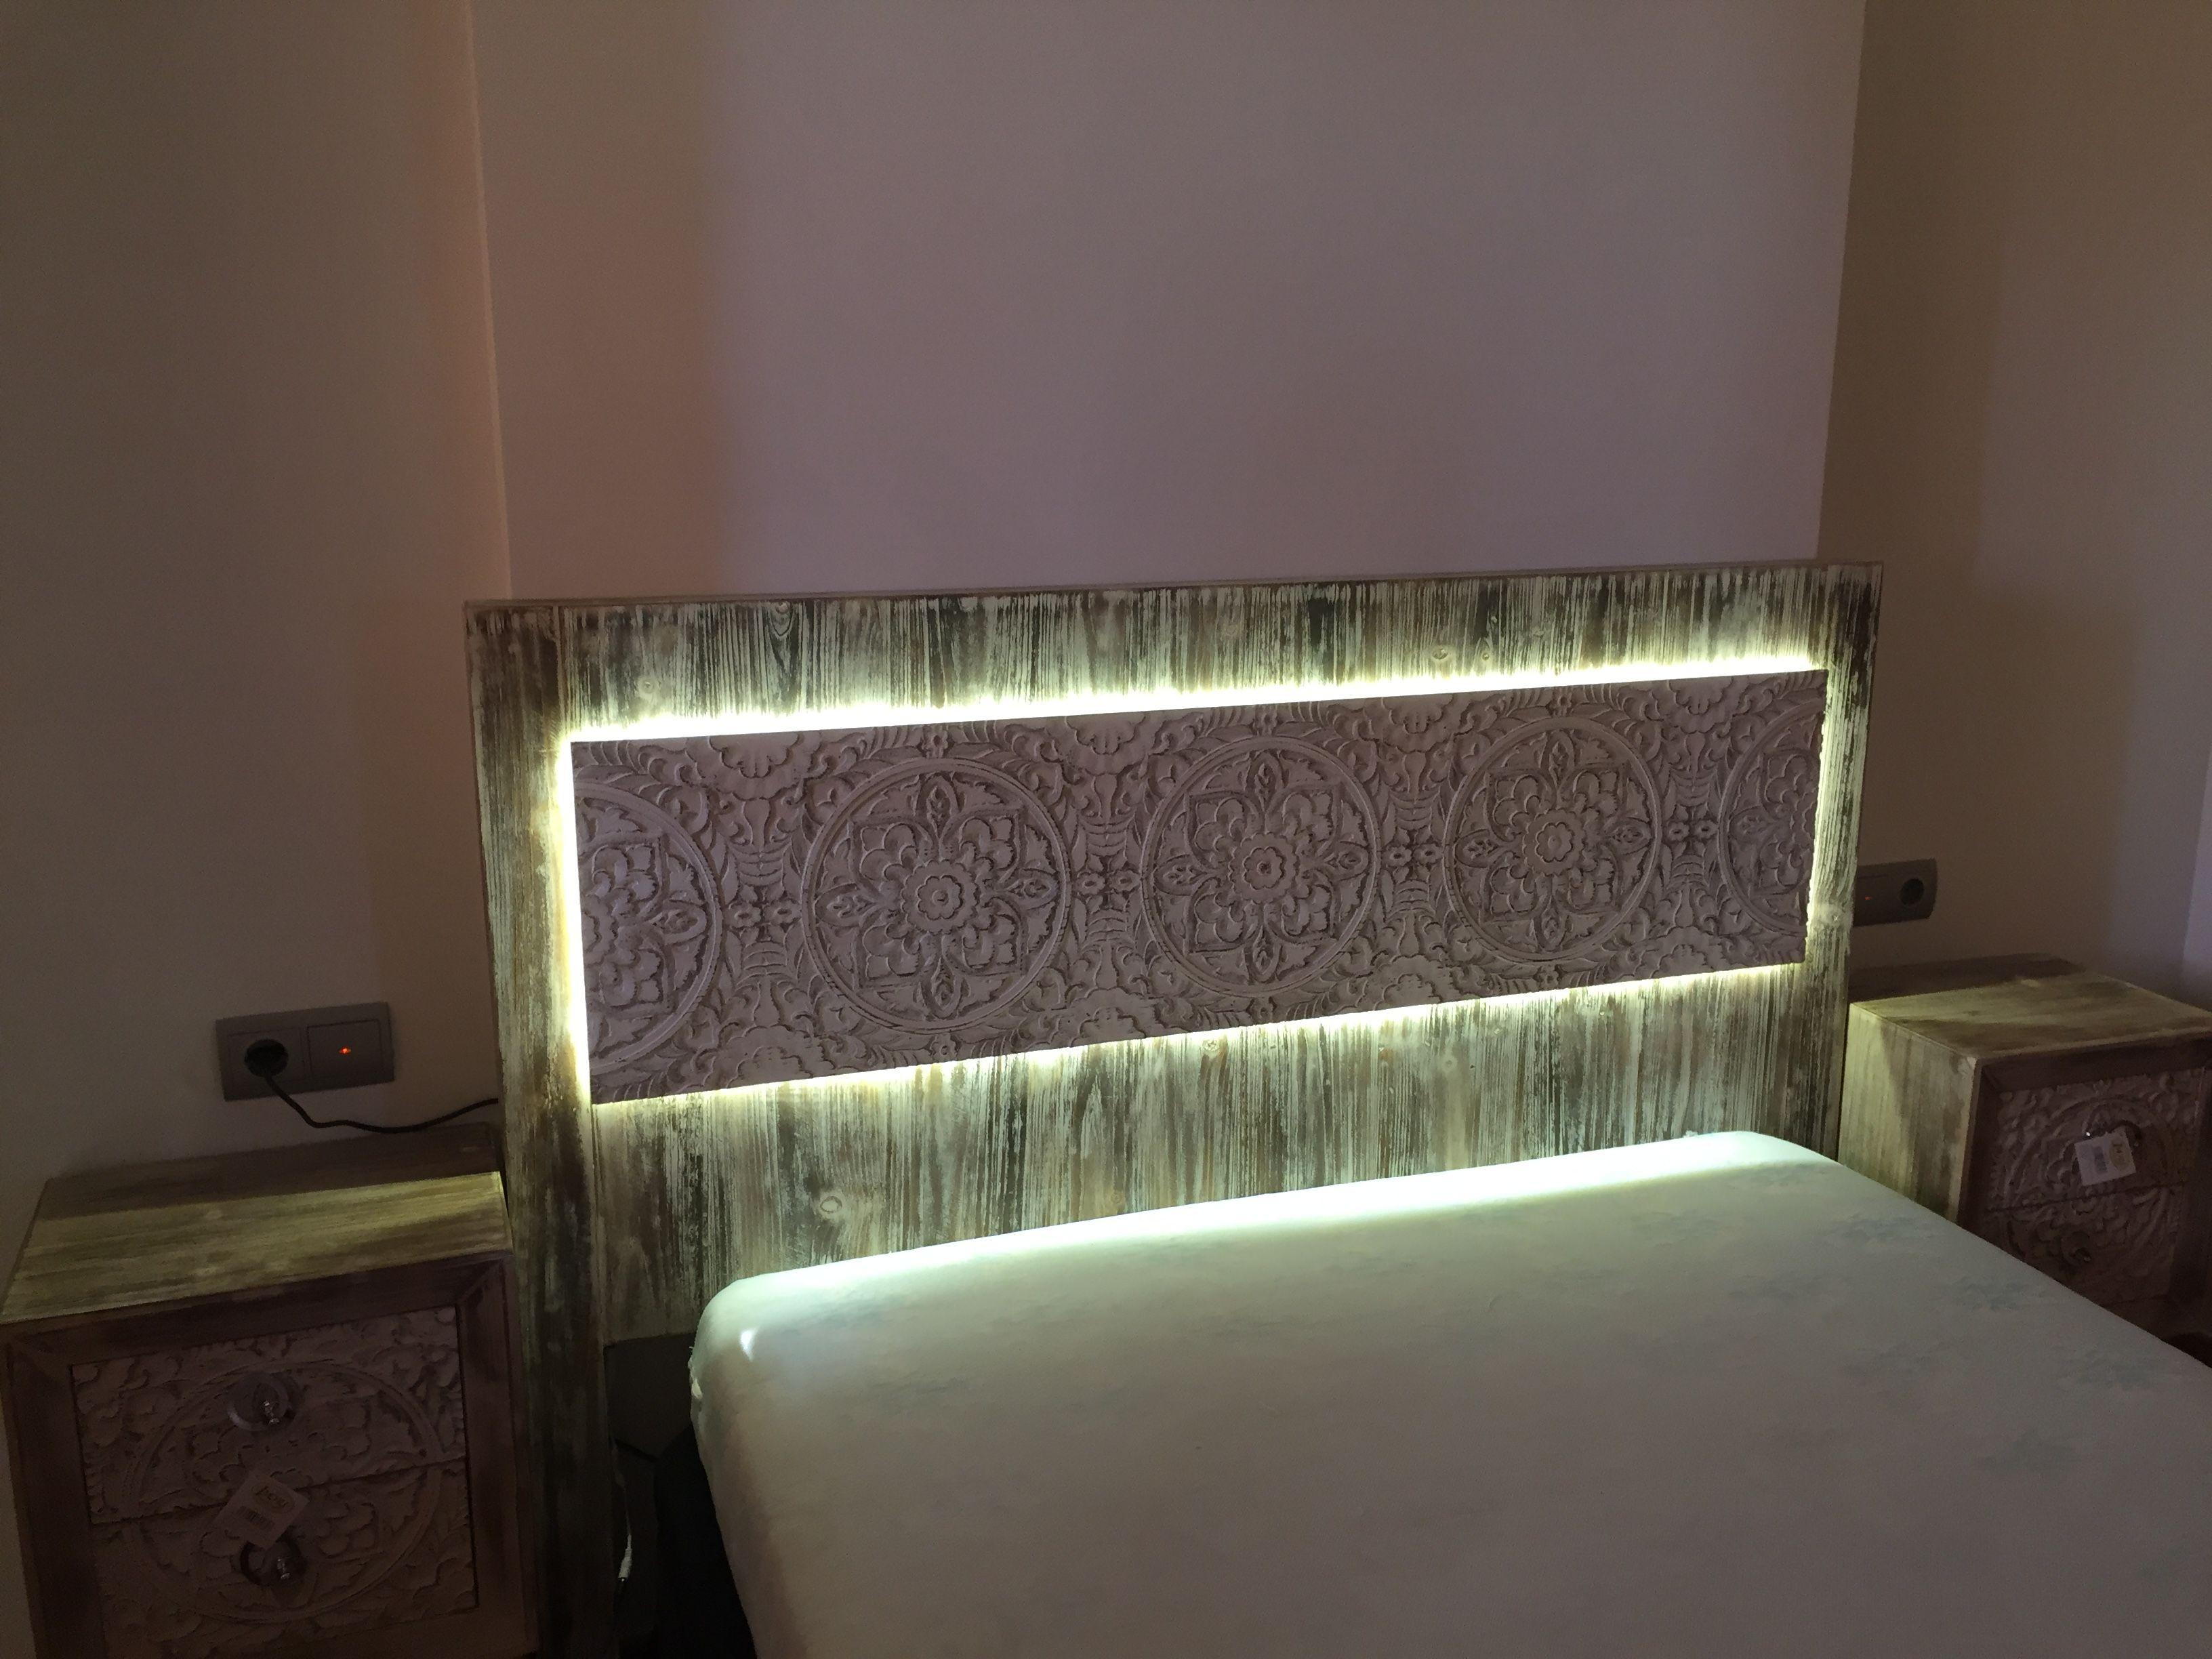 Cabecero madera tallada con iluminacion led karol dekora outlet pinterest outlets - Cabecero madera tallada ...